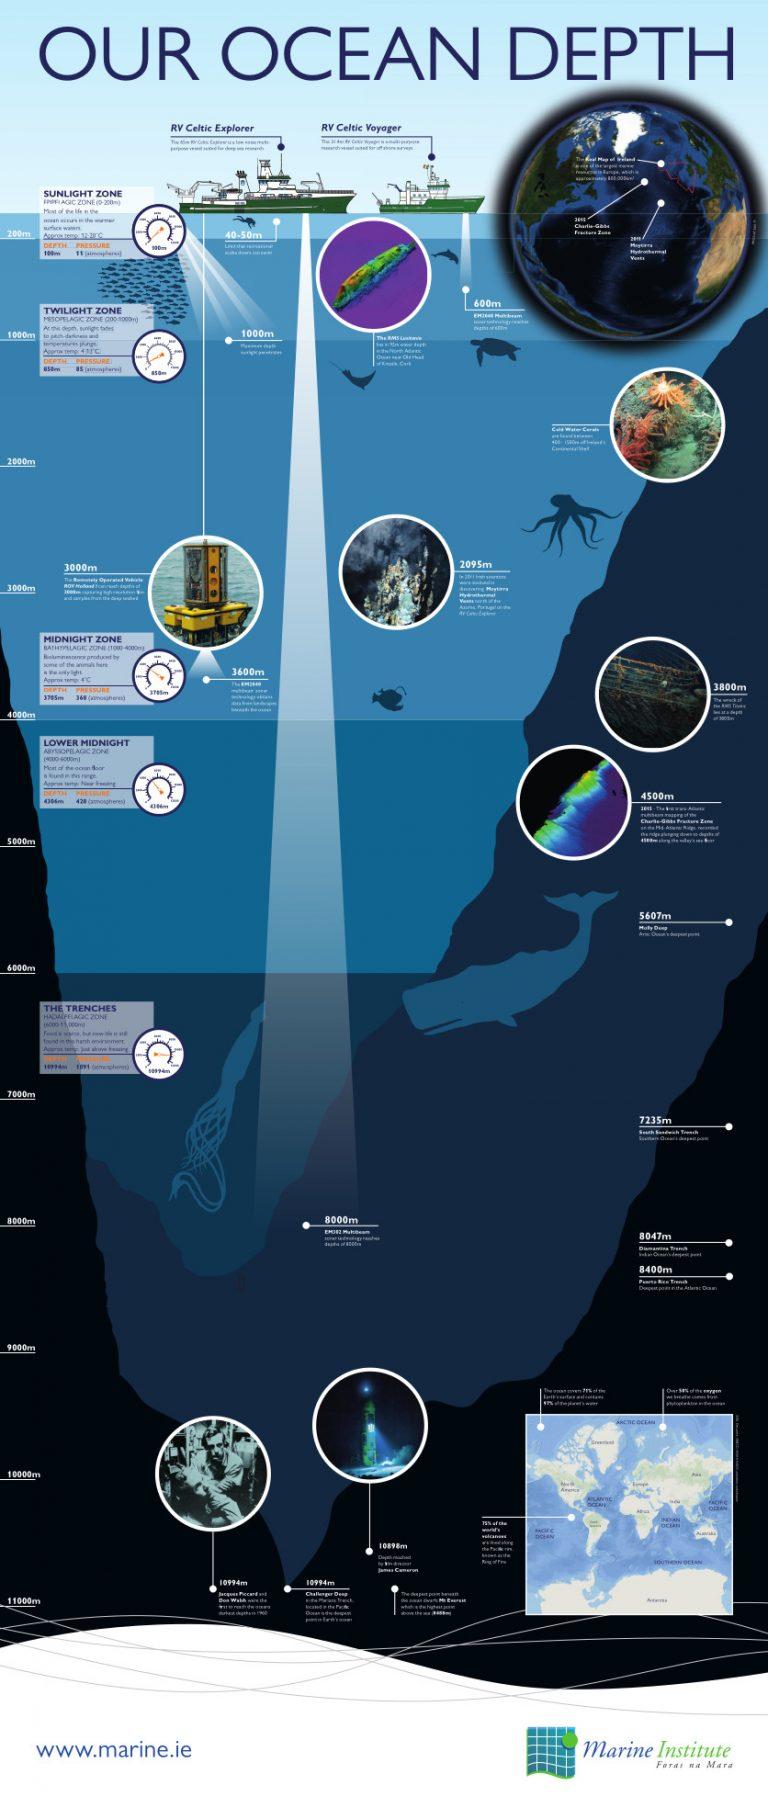 How Deep is our Ocean?